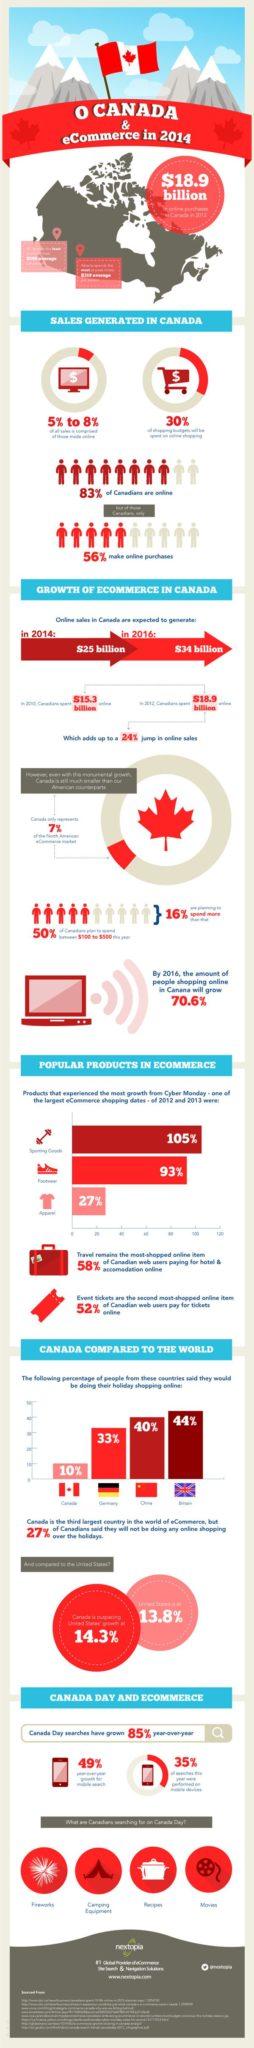 canada-ecommerce-infographic